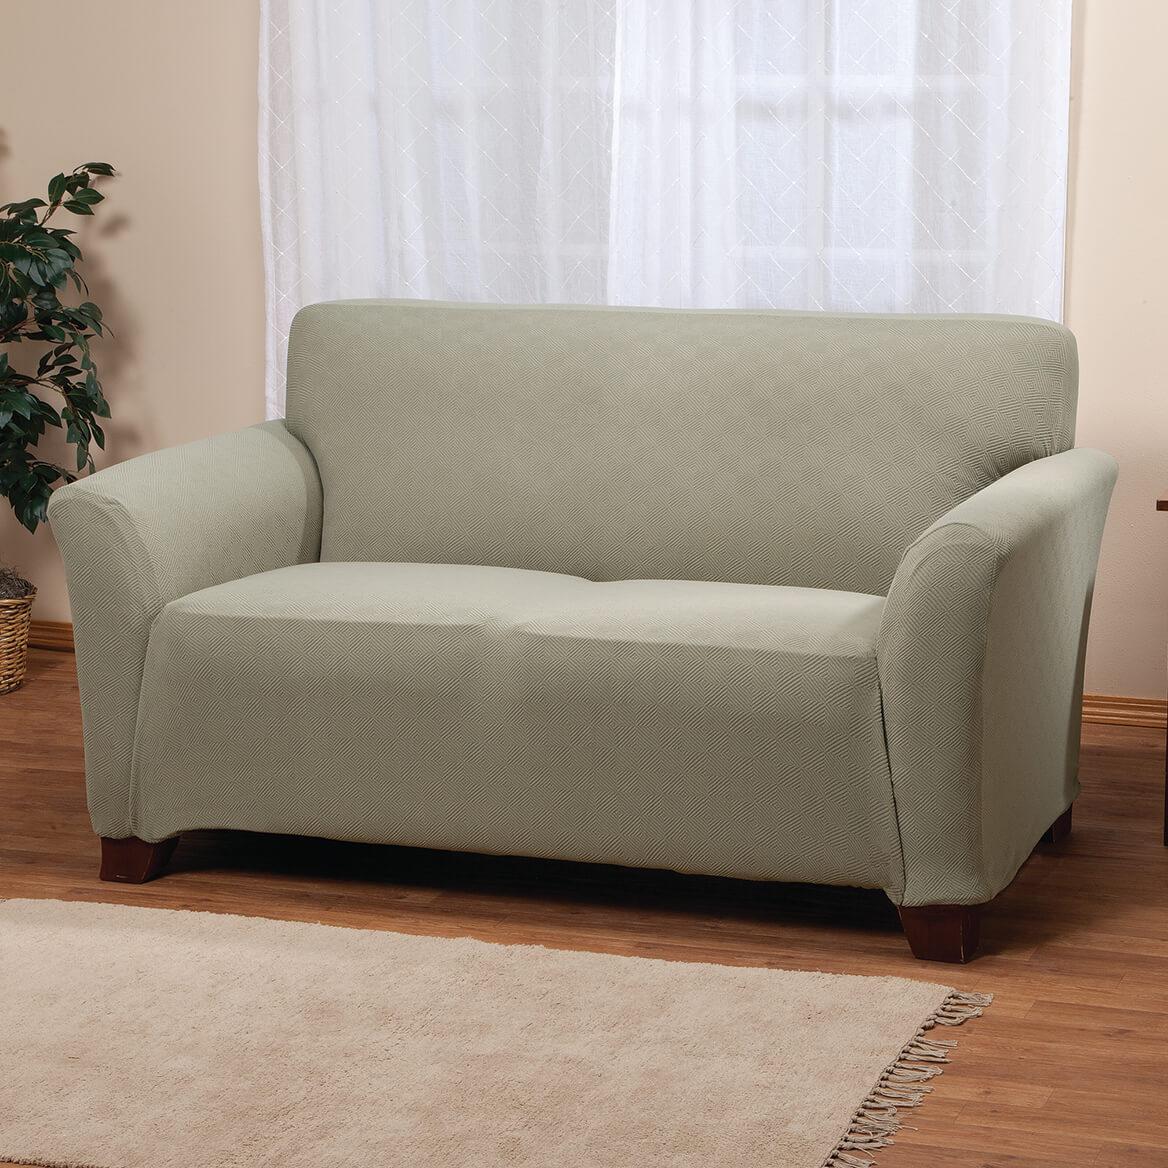 Newport Stretch Sofa Cover-353265